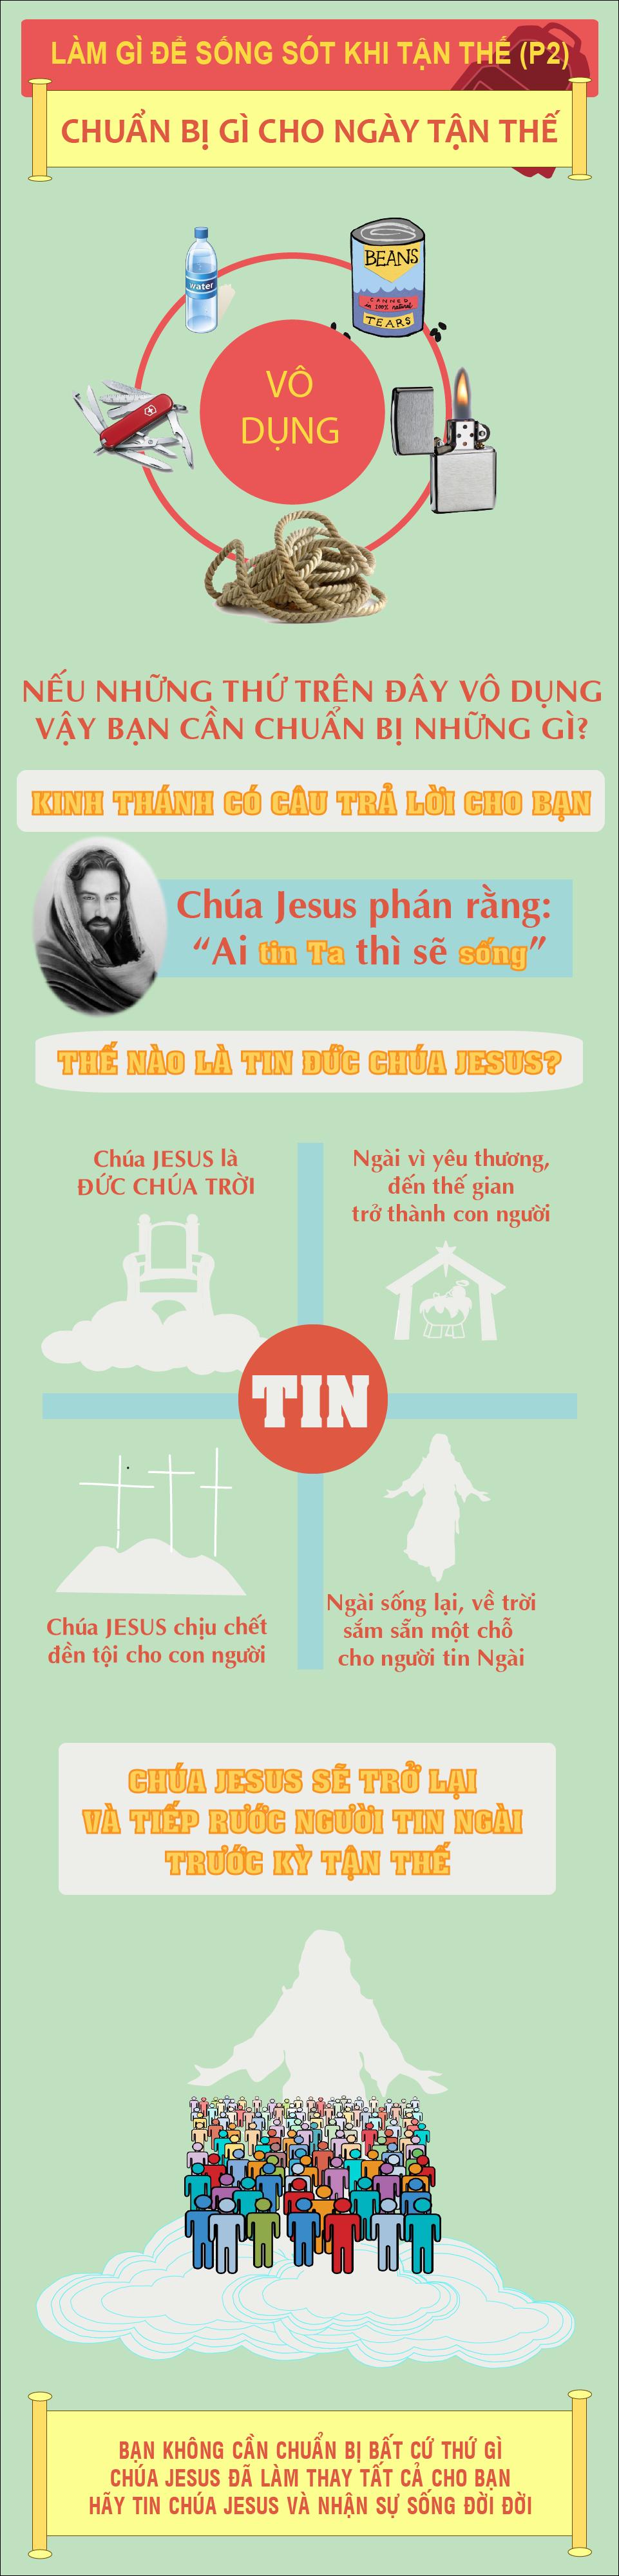 infographic chuan bi cho tan the 2